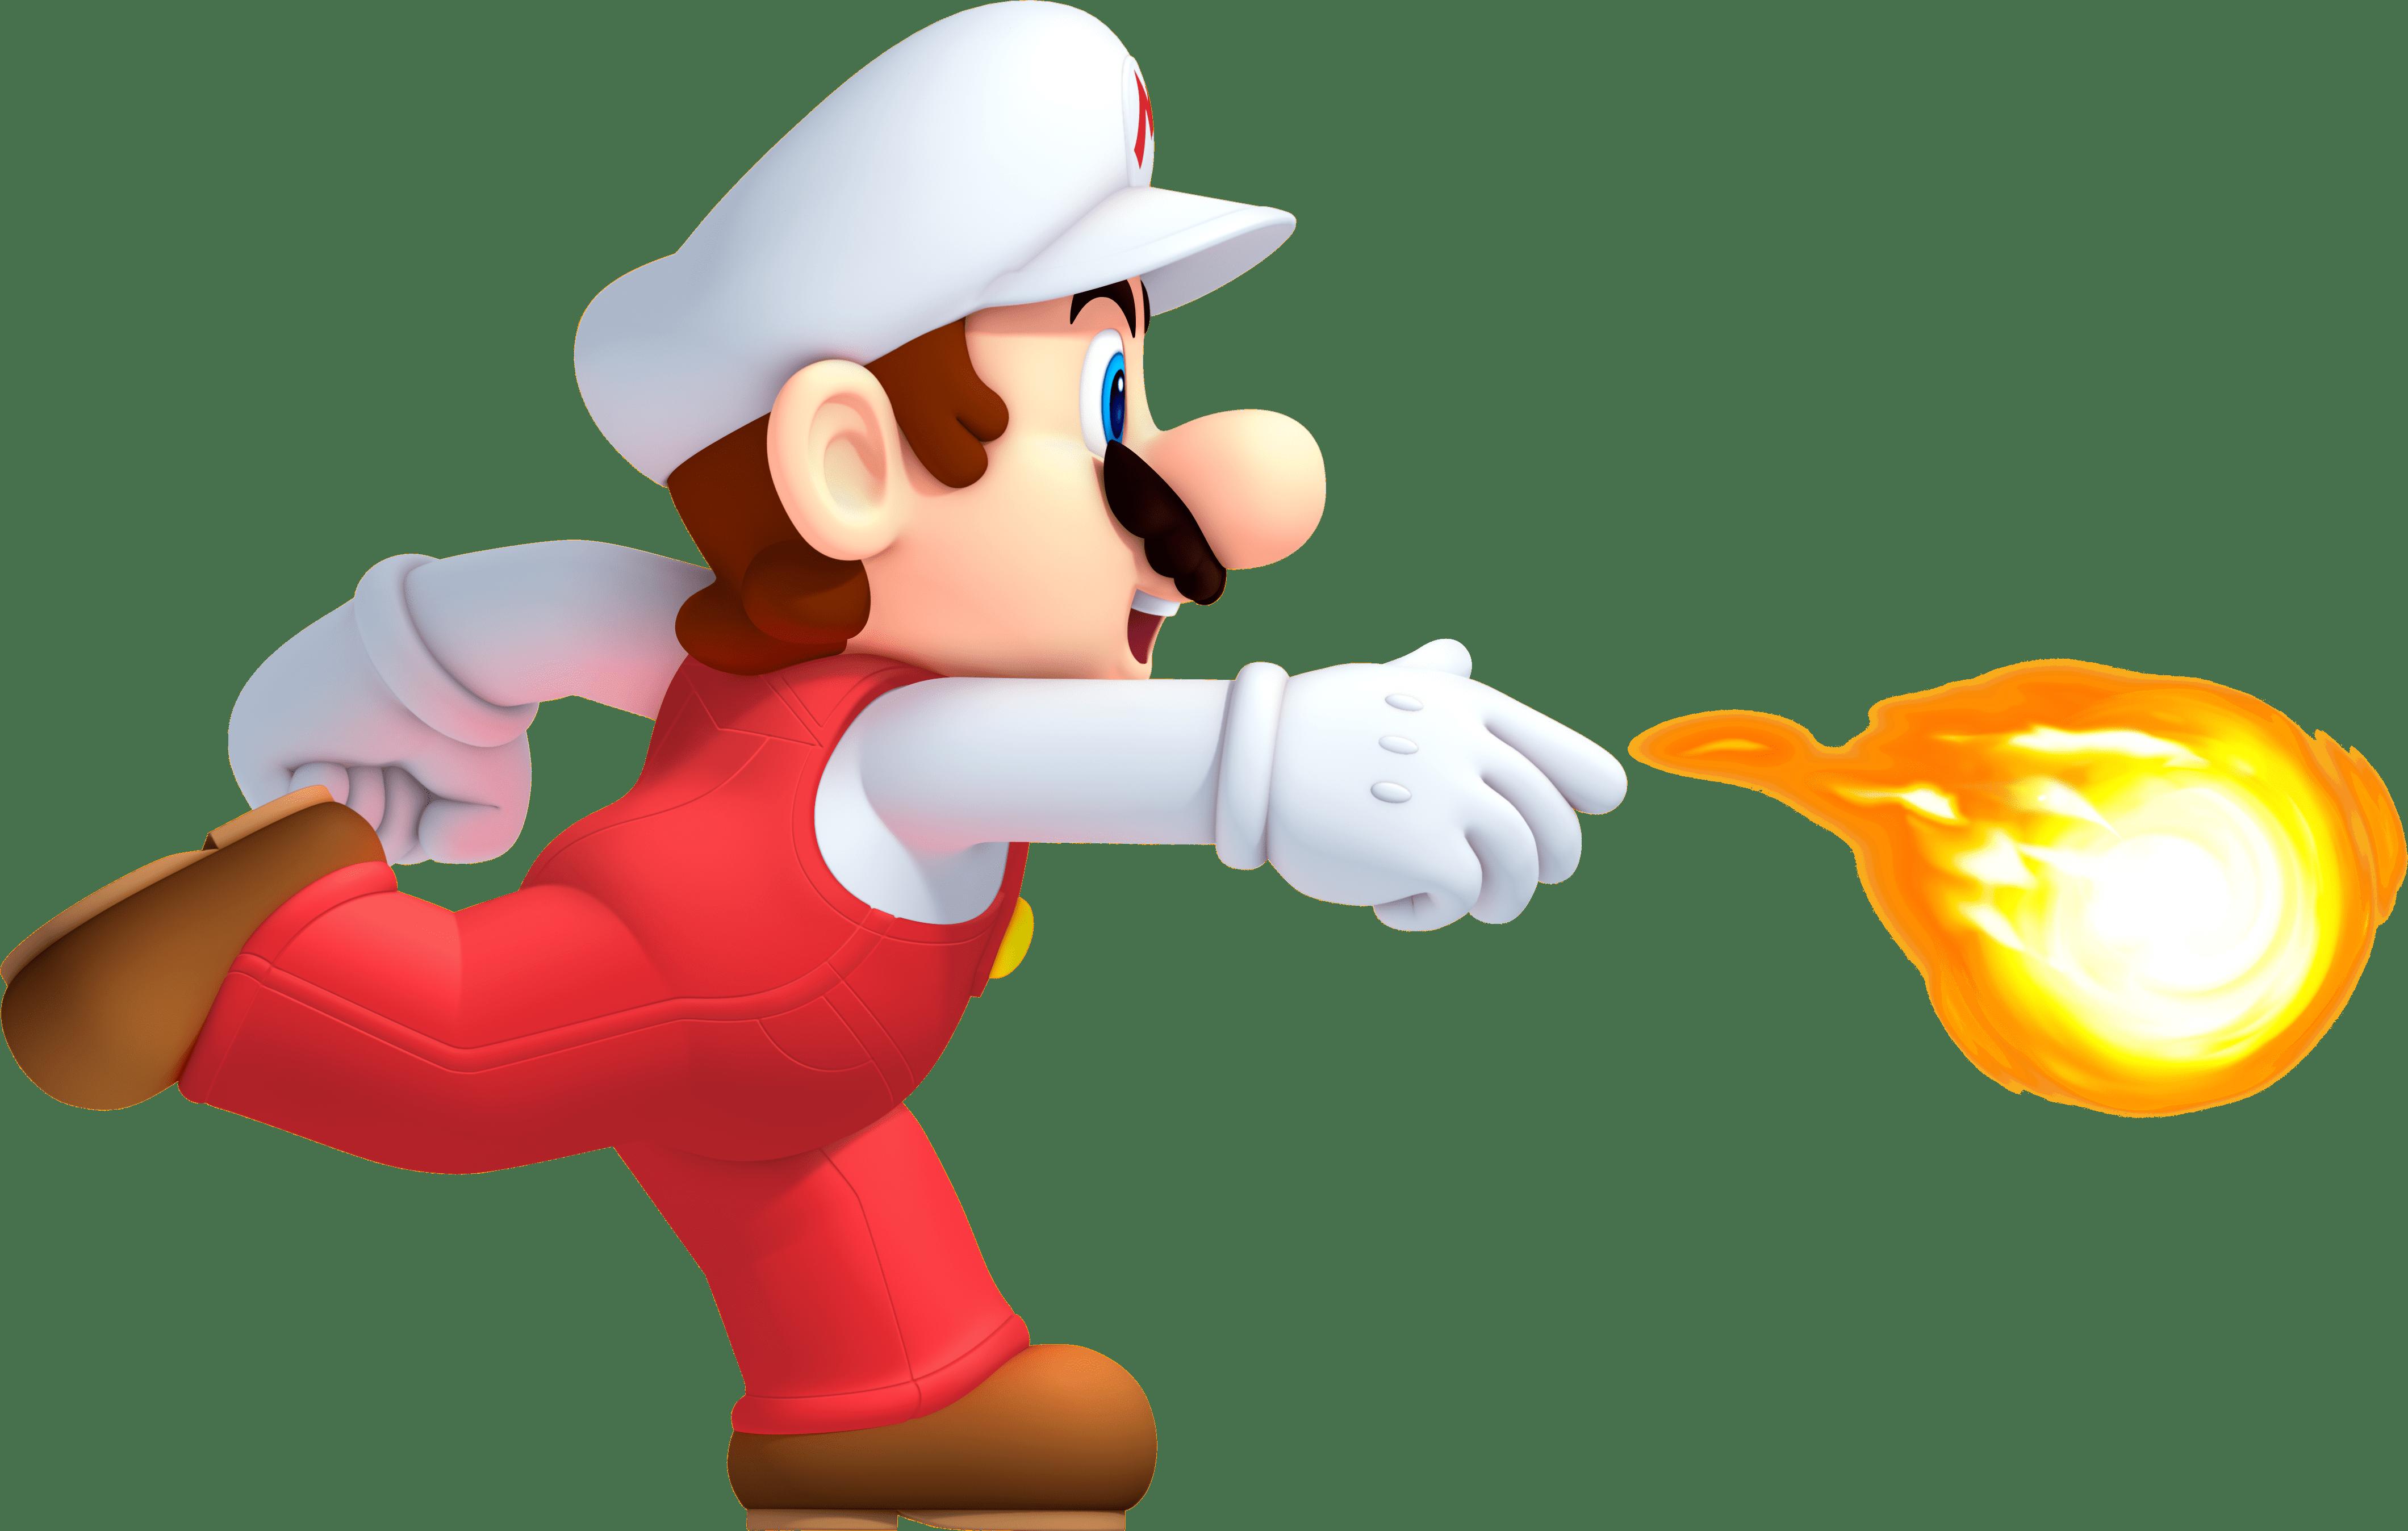 Mario star clipart png jpg download Mario Stars transparent PNG - StickPNG jpg download